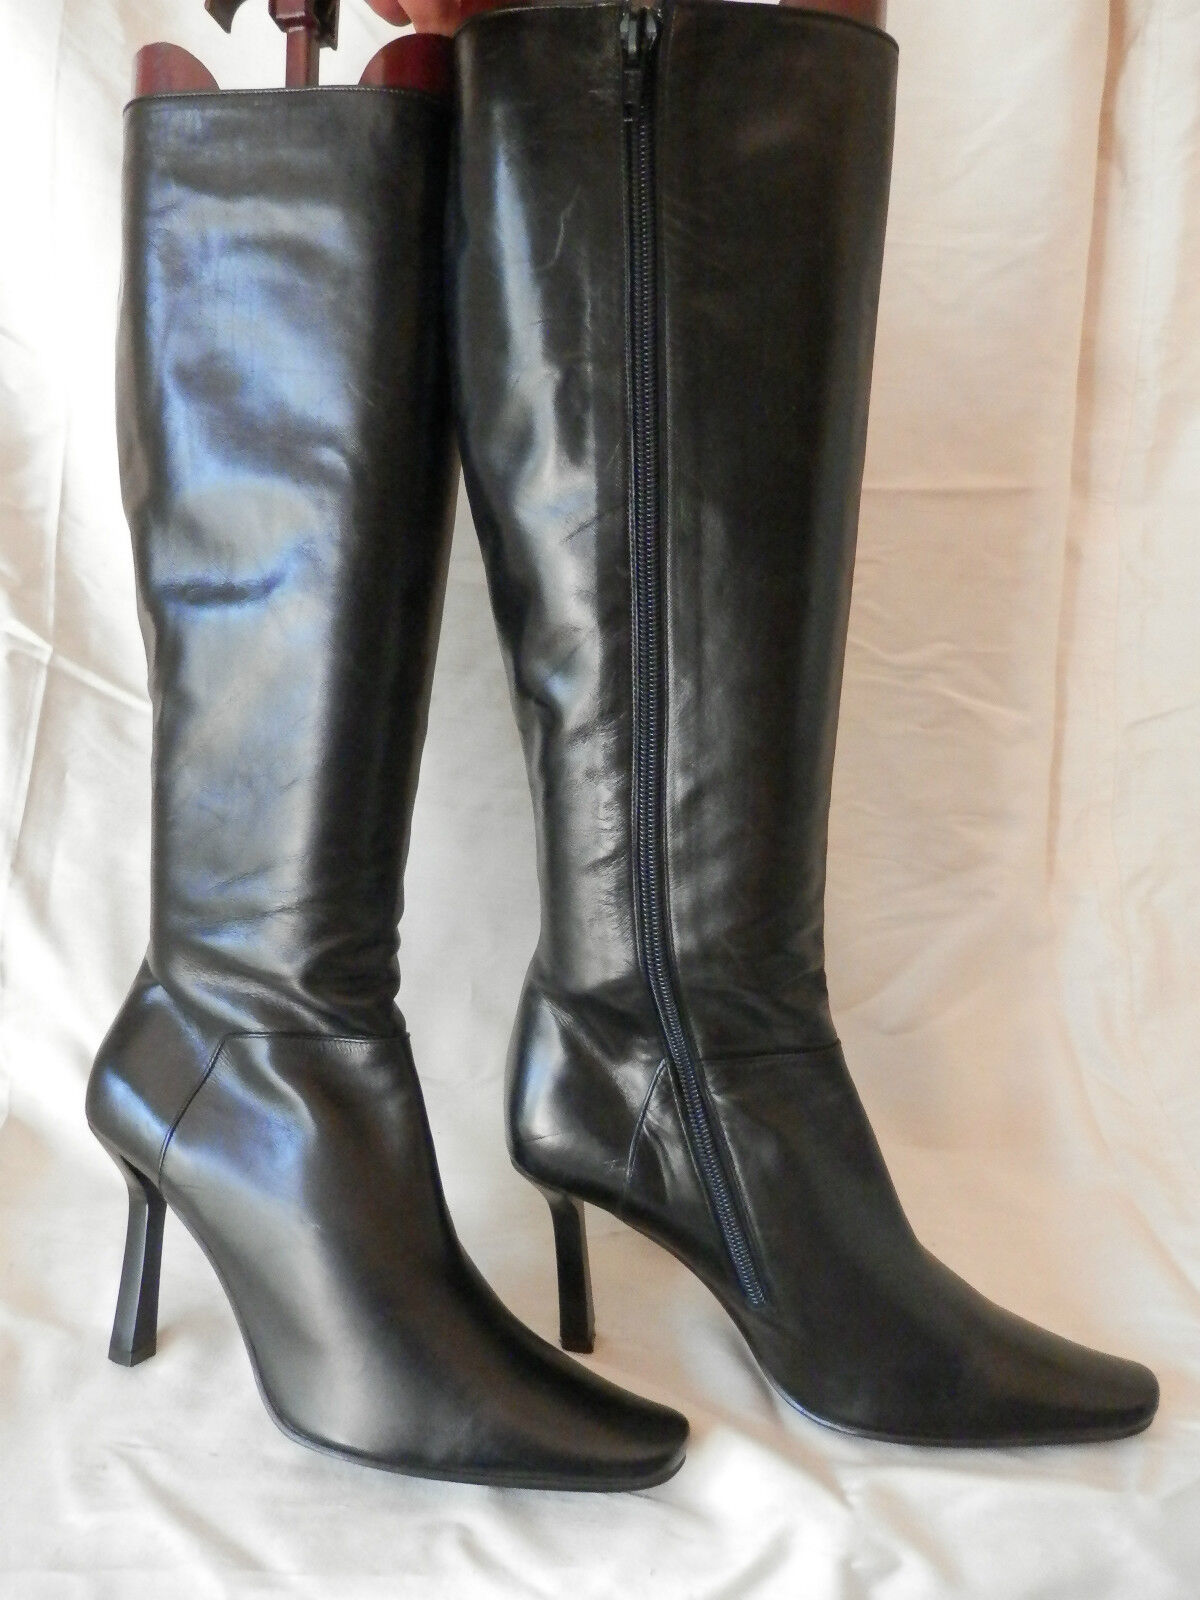 botas luxe habillées talon, Made italy 100% CUIR negro  T 36 36,5 très bon état